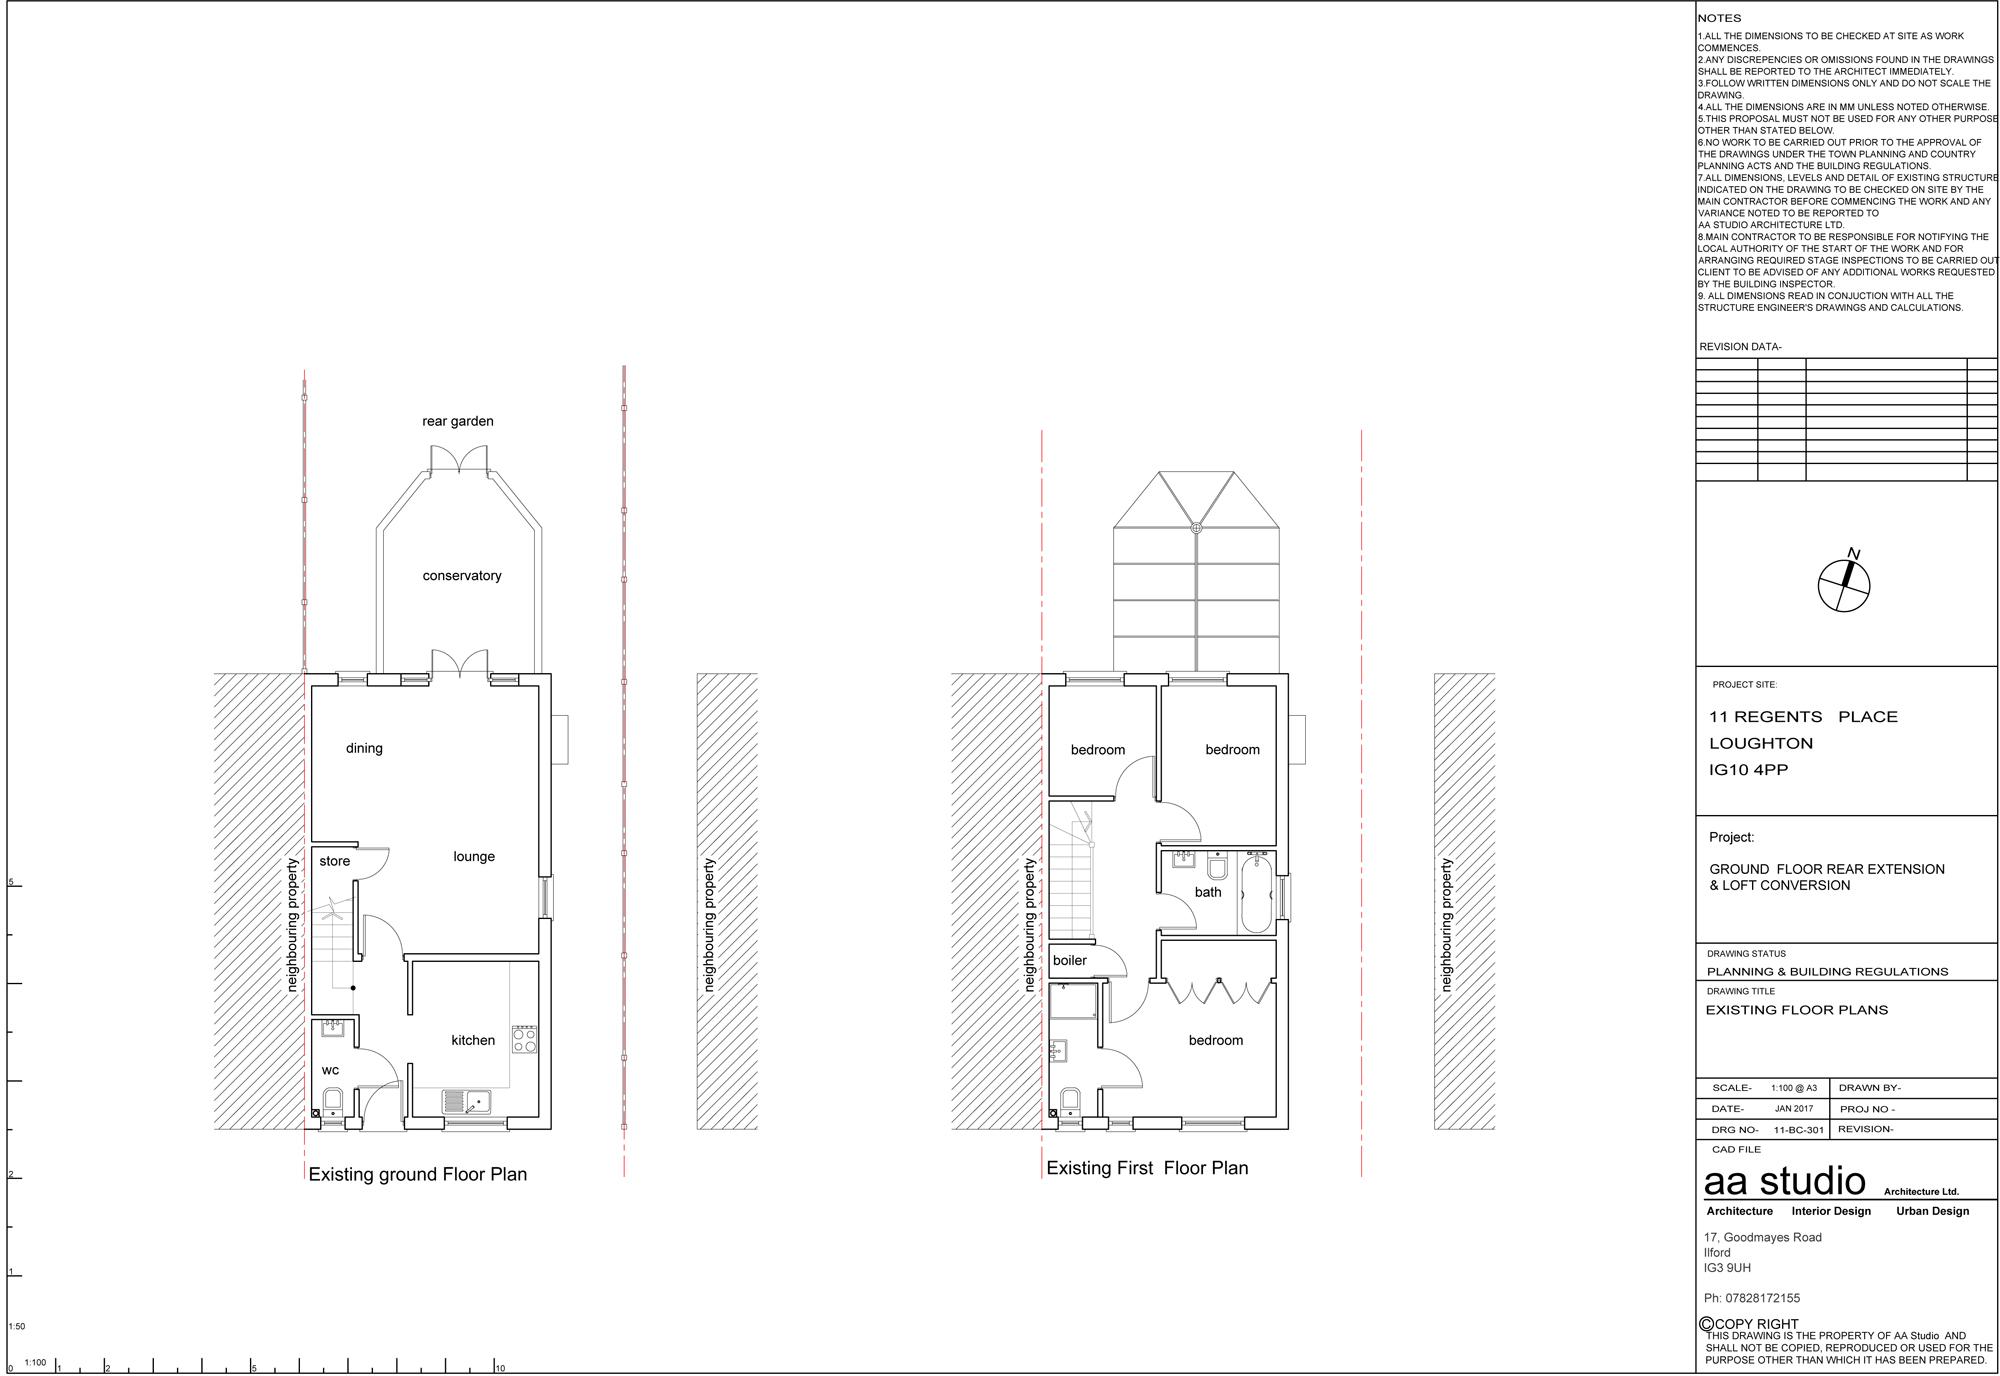 Architectrue Services Loughton